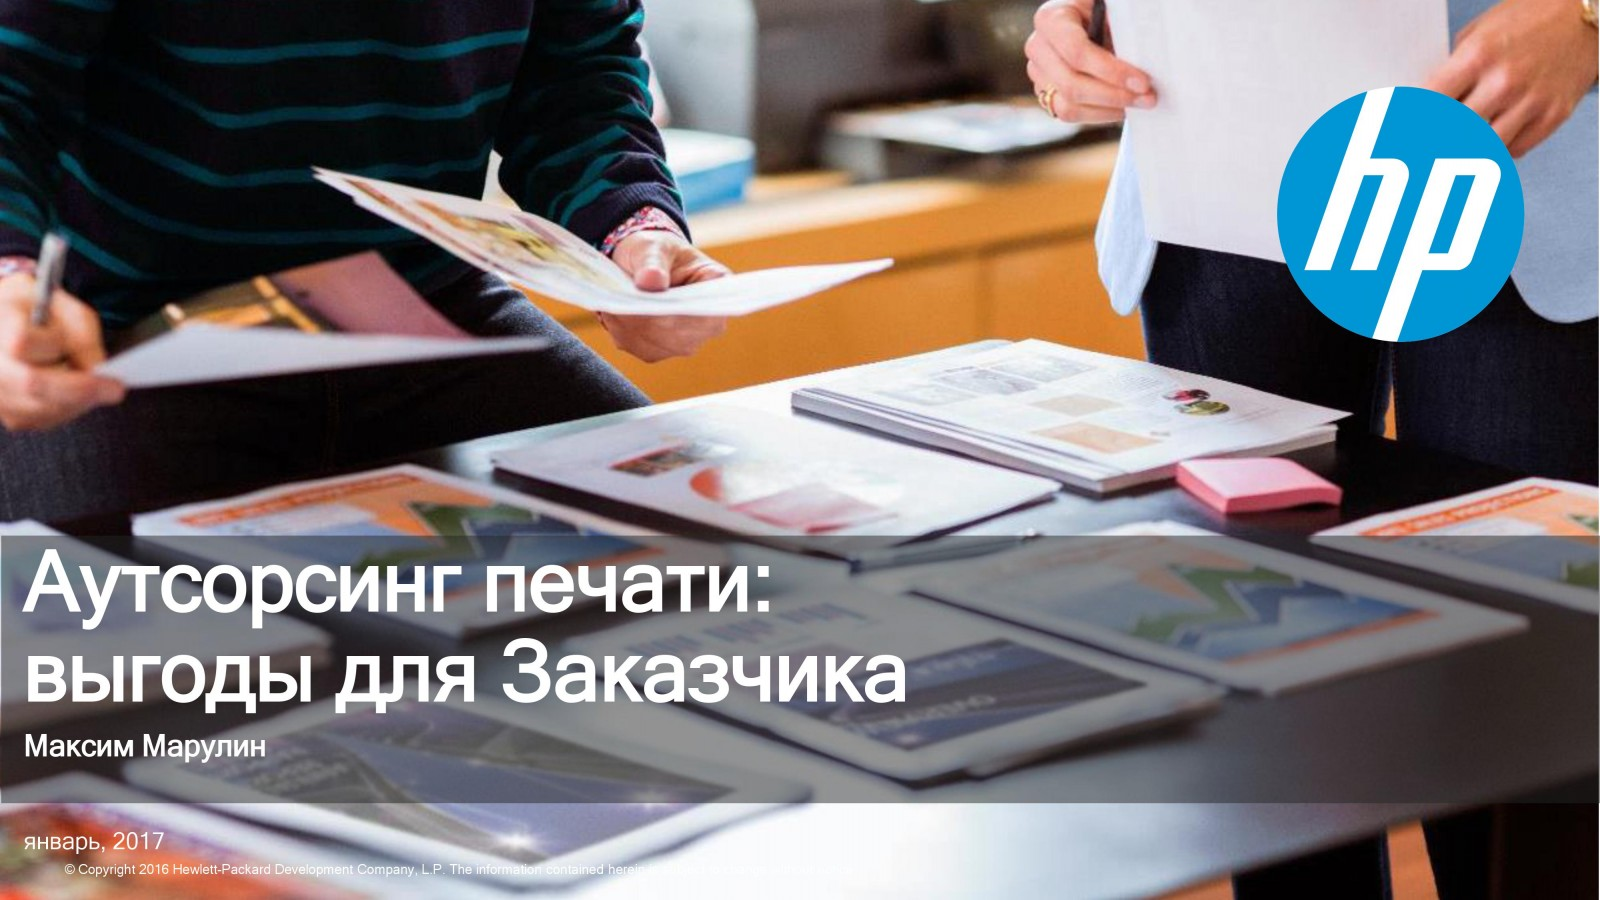 Аутсорсинг печати - выгоды для заказчика